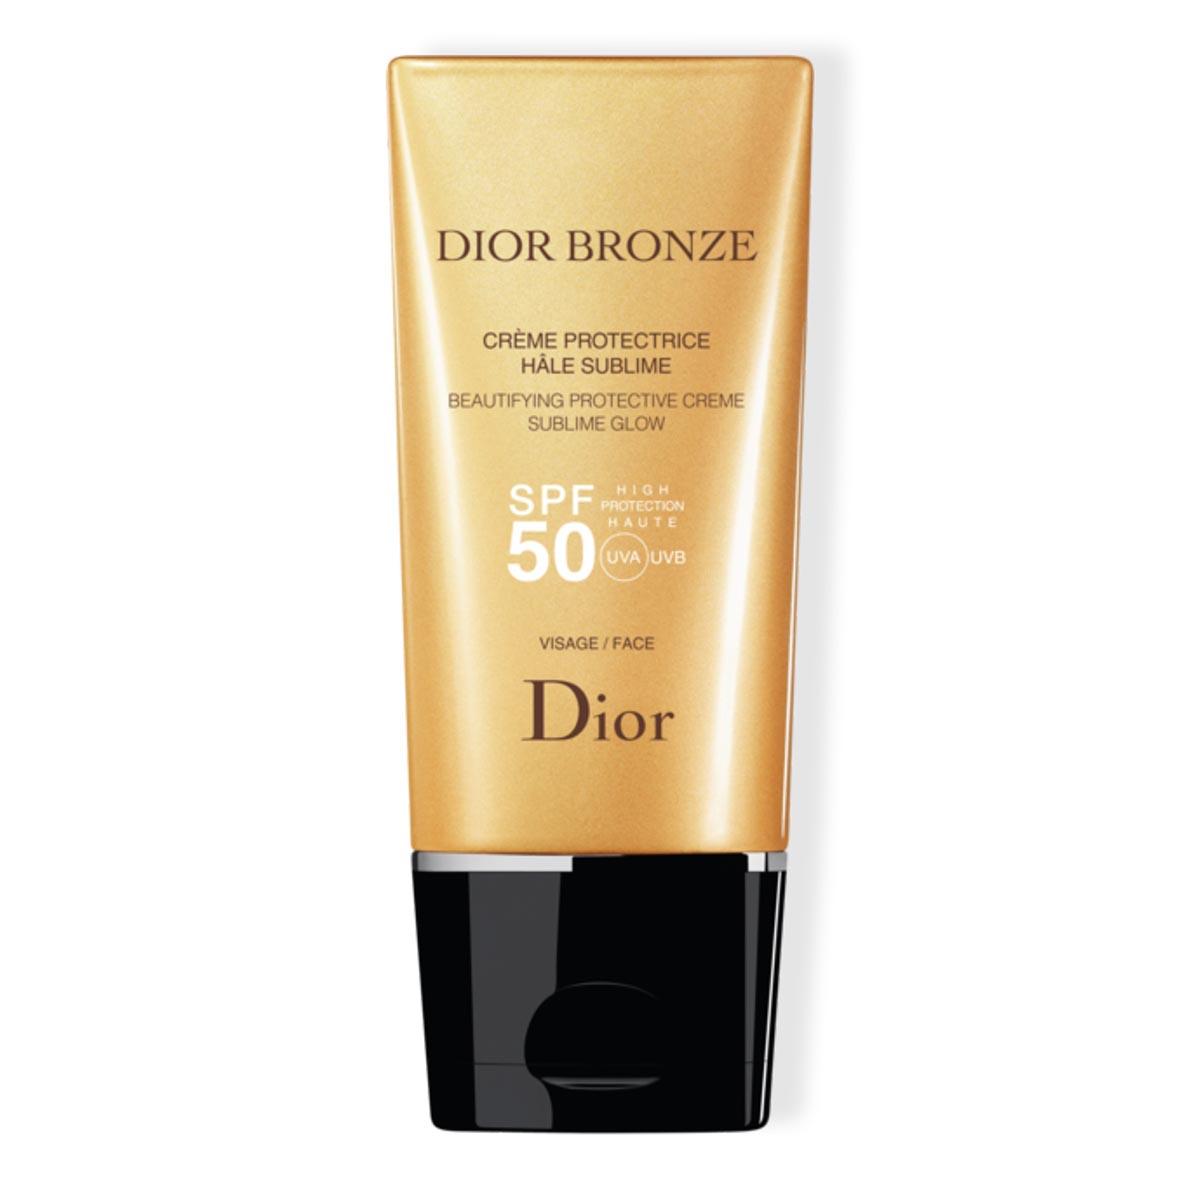 Dior bronze sublime glow spf50 cream 50ml